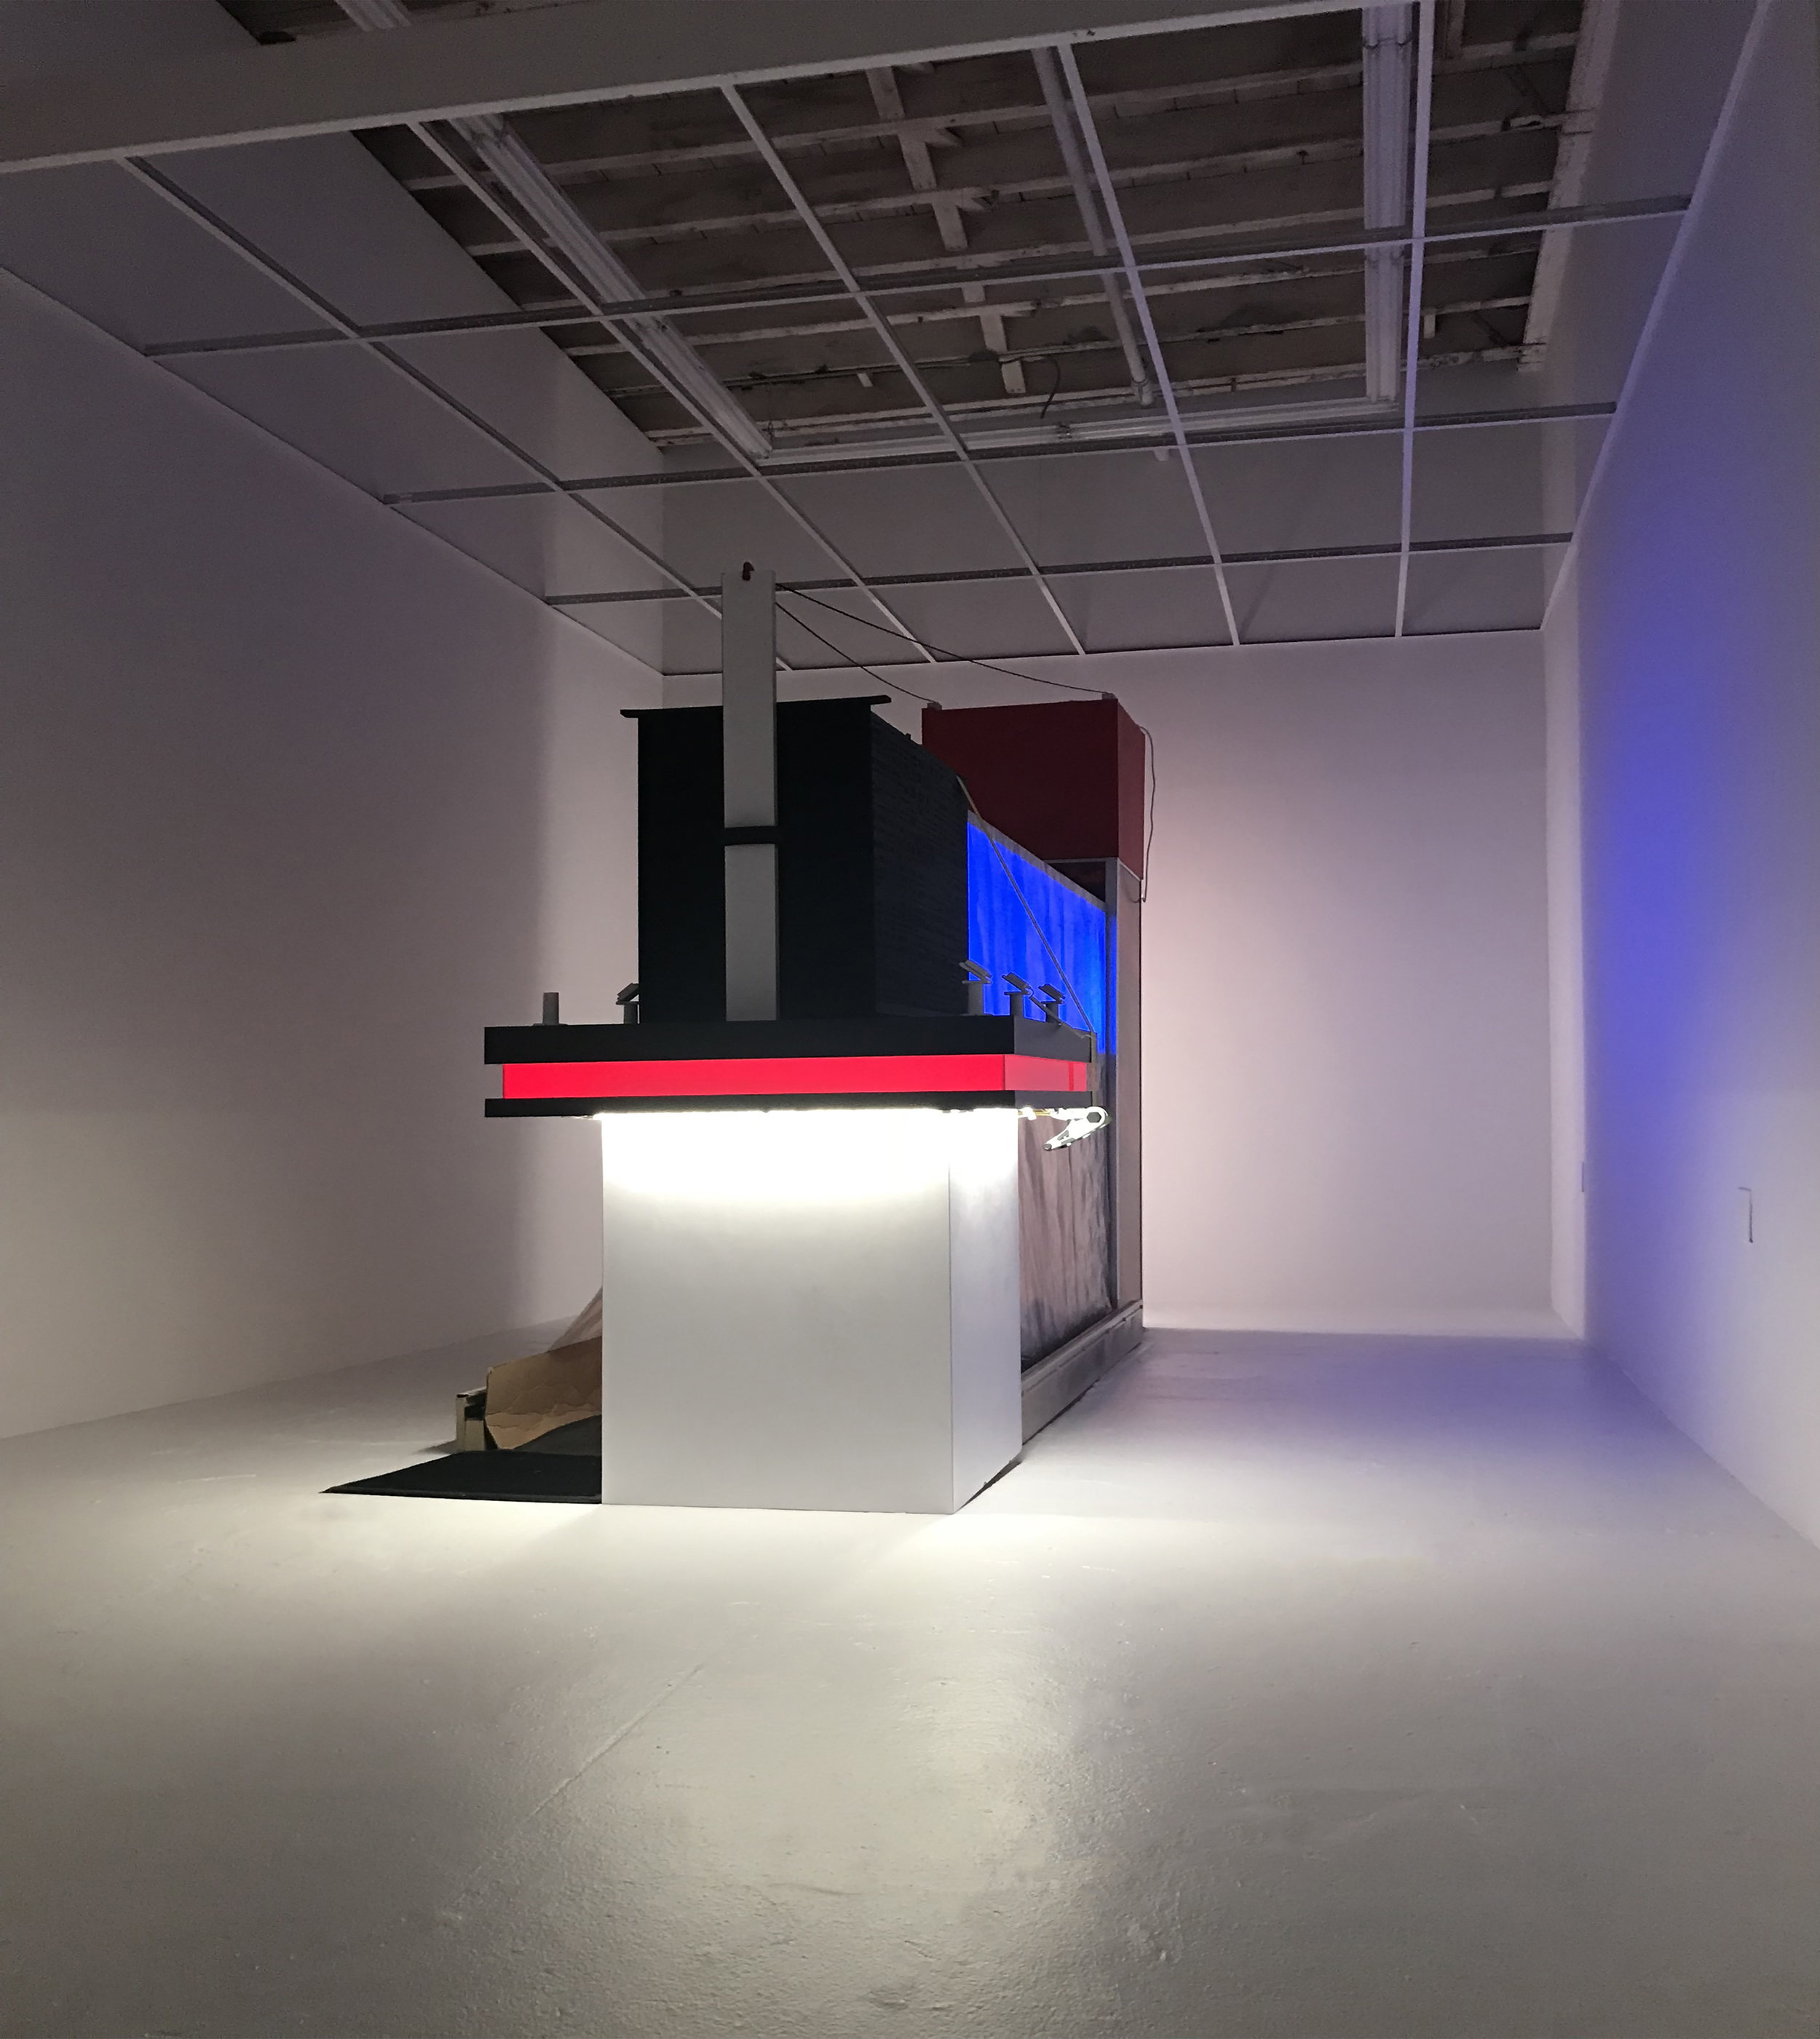 Jonathan Mildenberg  I.N.C.H. ,2018 wood, Formica, plexiglass, LED lights, ratchet straps, prefabricated cellphone security displays, carpet, foam, plastic tarp, rubber,tile, cardboard, steel, prefabricated light box, subwoofer, aluminum, self-adhesive vinyl, drywall, bed sheet, yoga mat, fabricated,neon light, mirror, porcelain tile, epoxy dimensions variable (JM6)